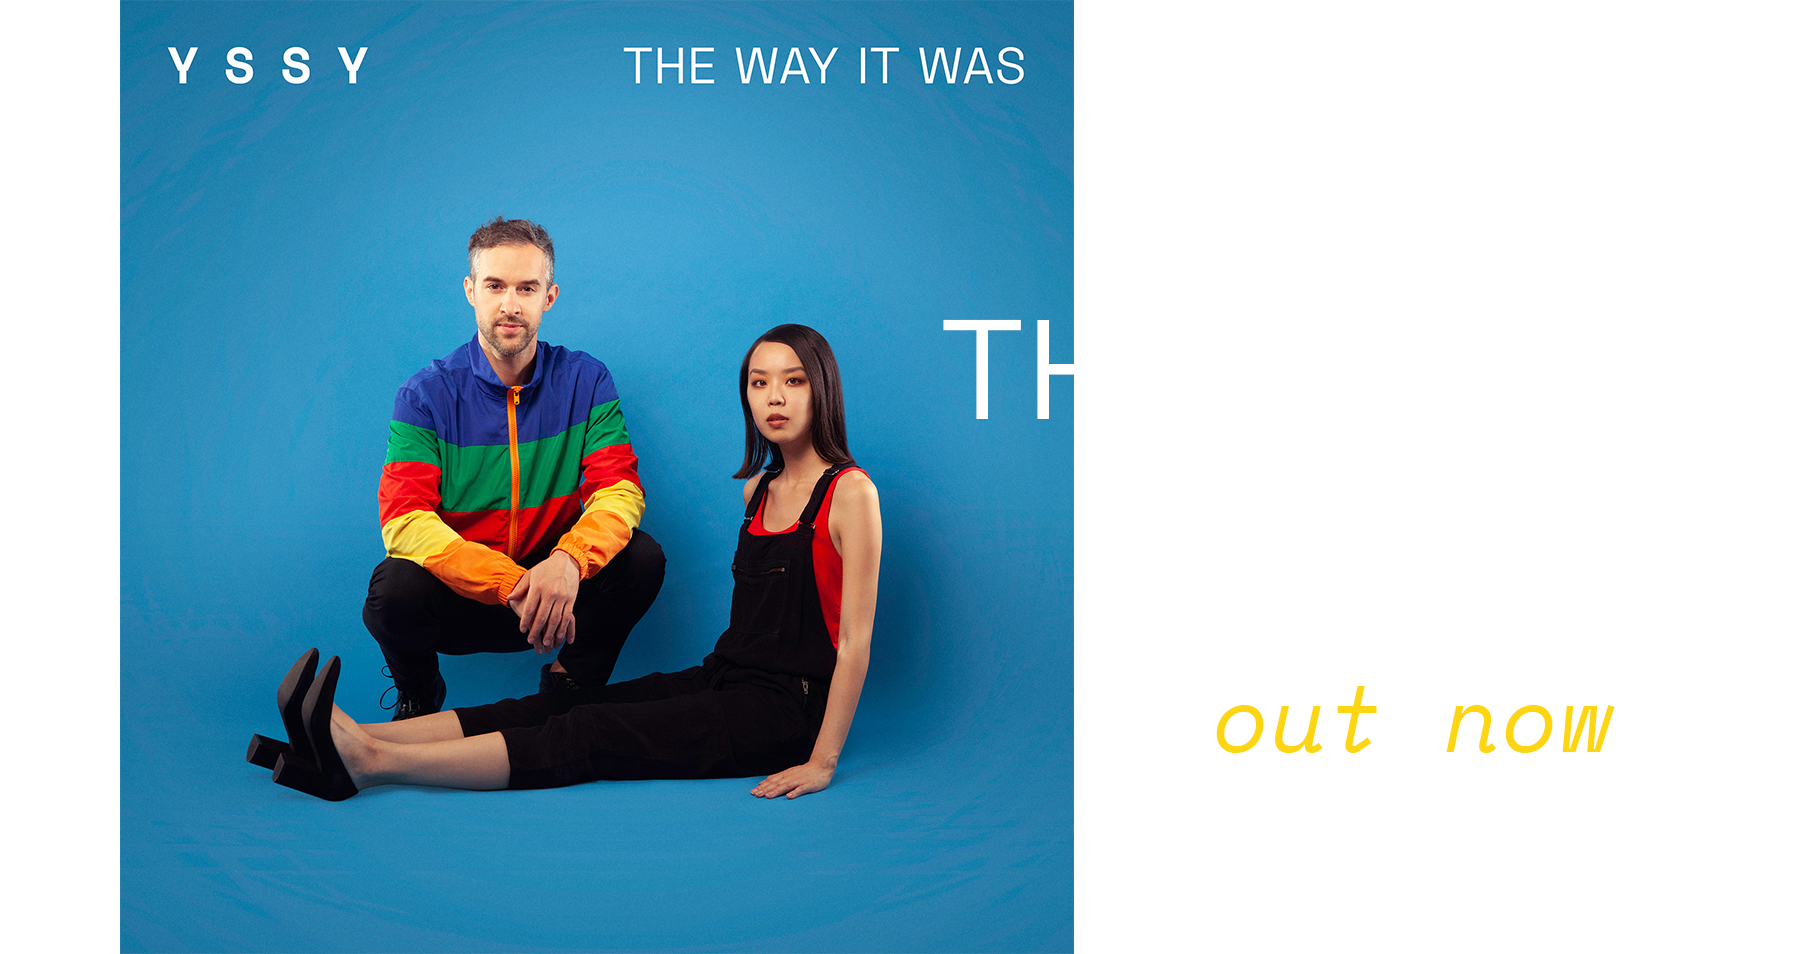 YSSY - The Way It Was